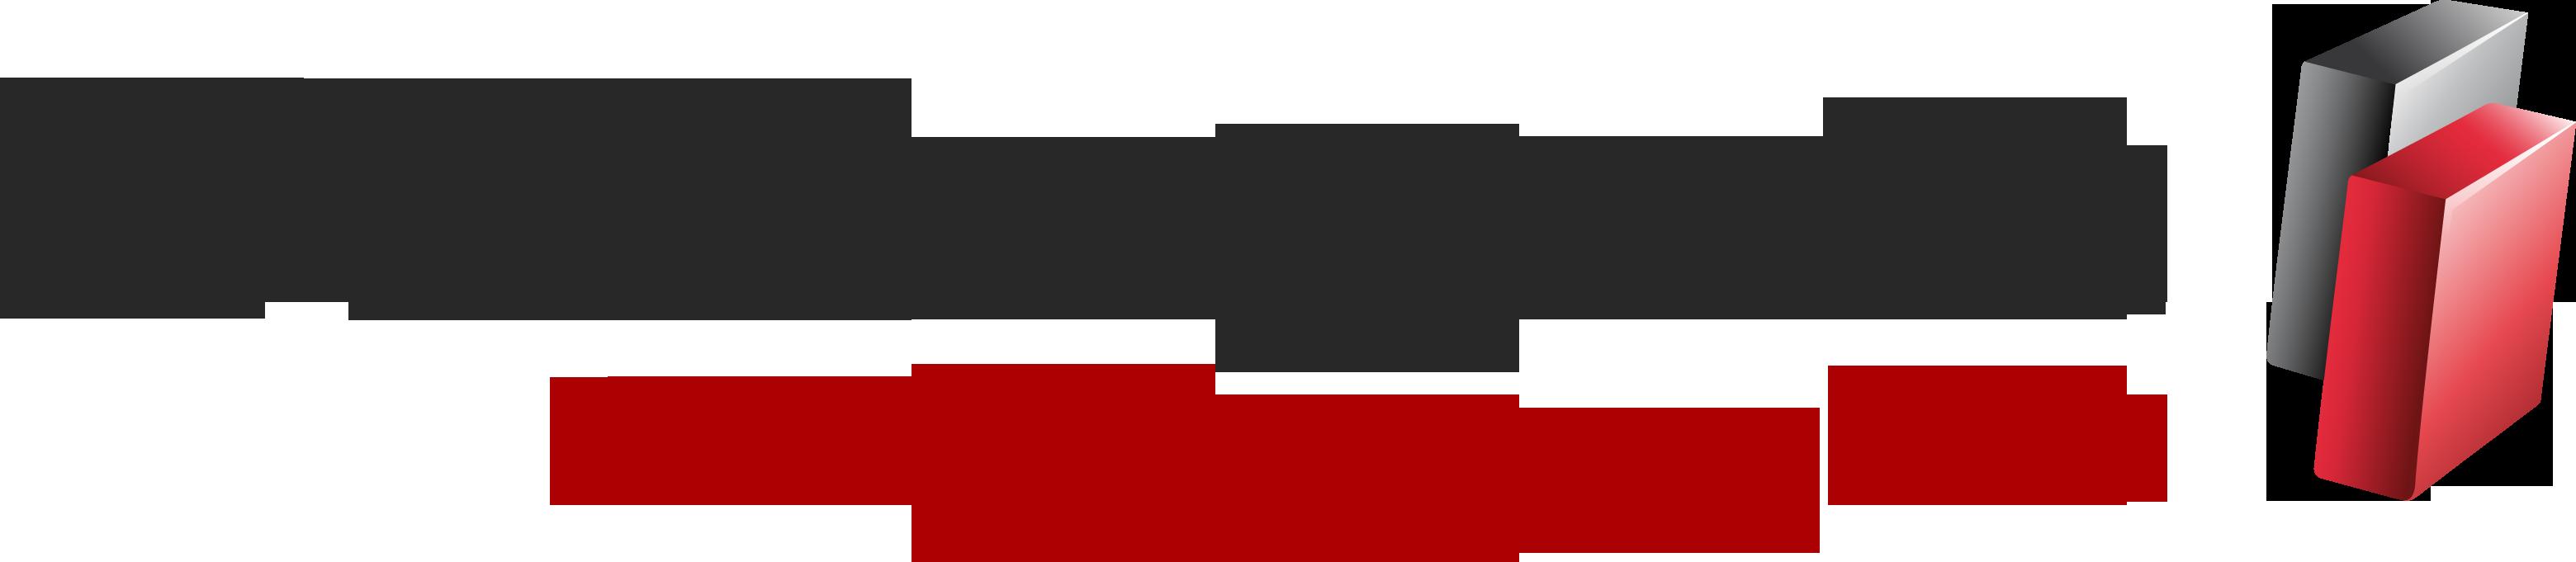 MTS Magnete - Der Magnetspezialist